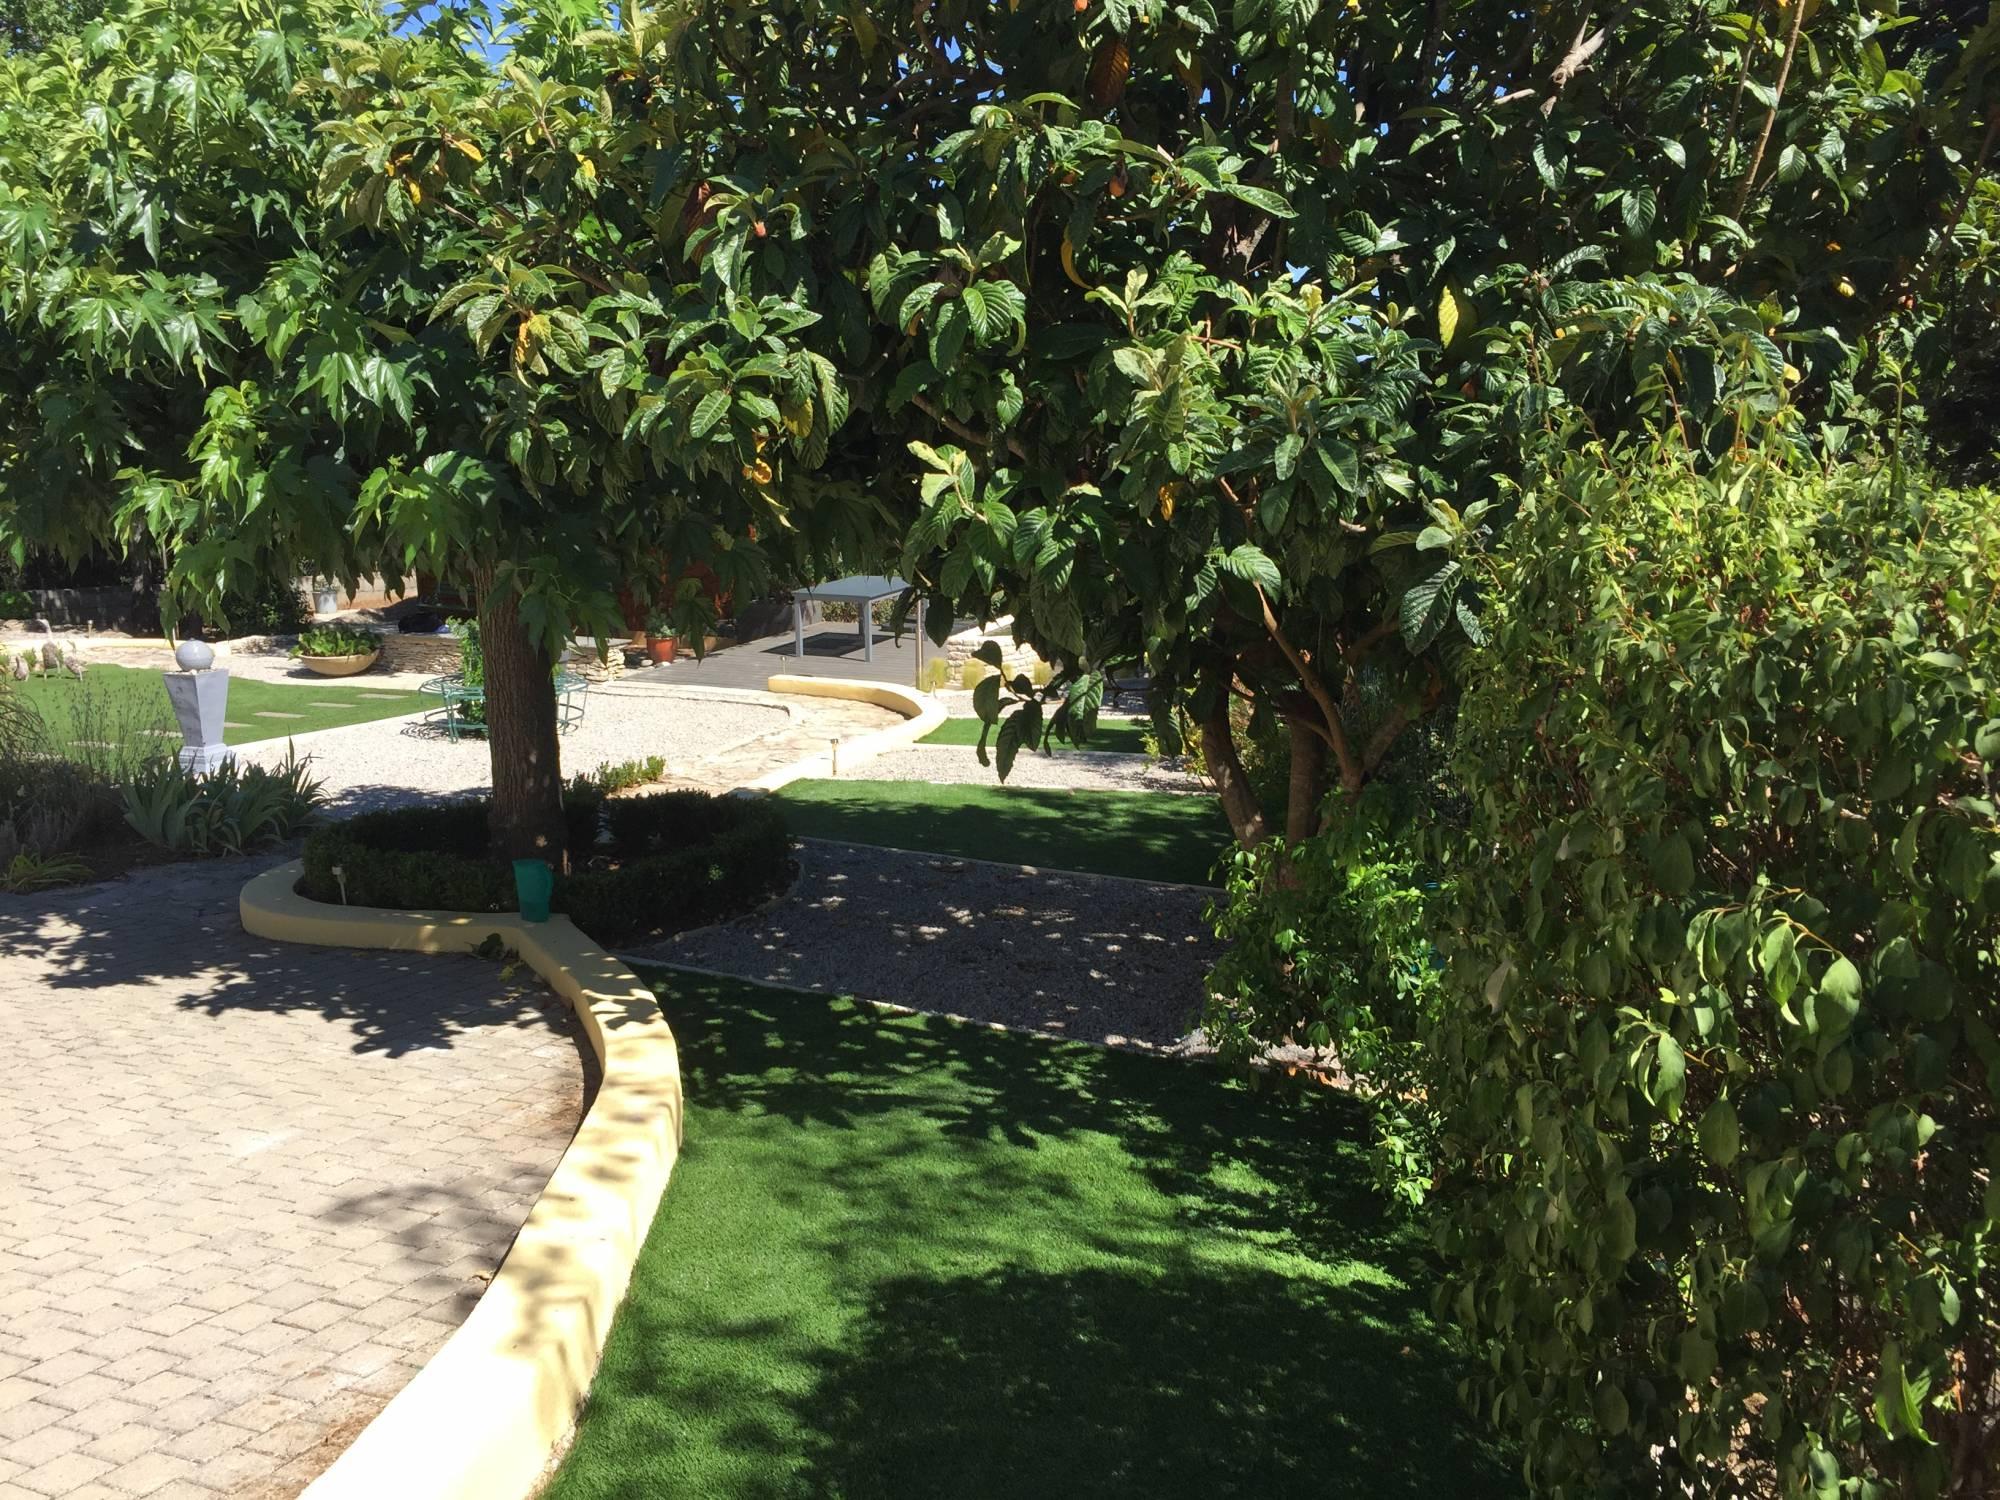 vente de pelouse artificielle à Nice